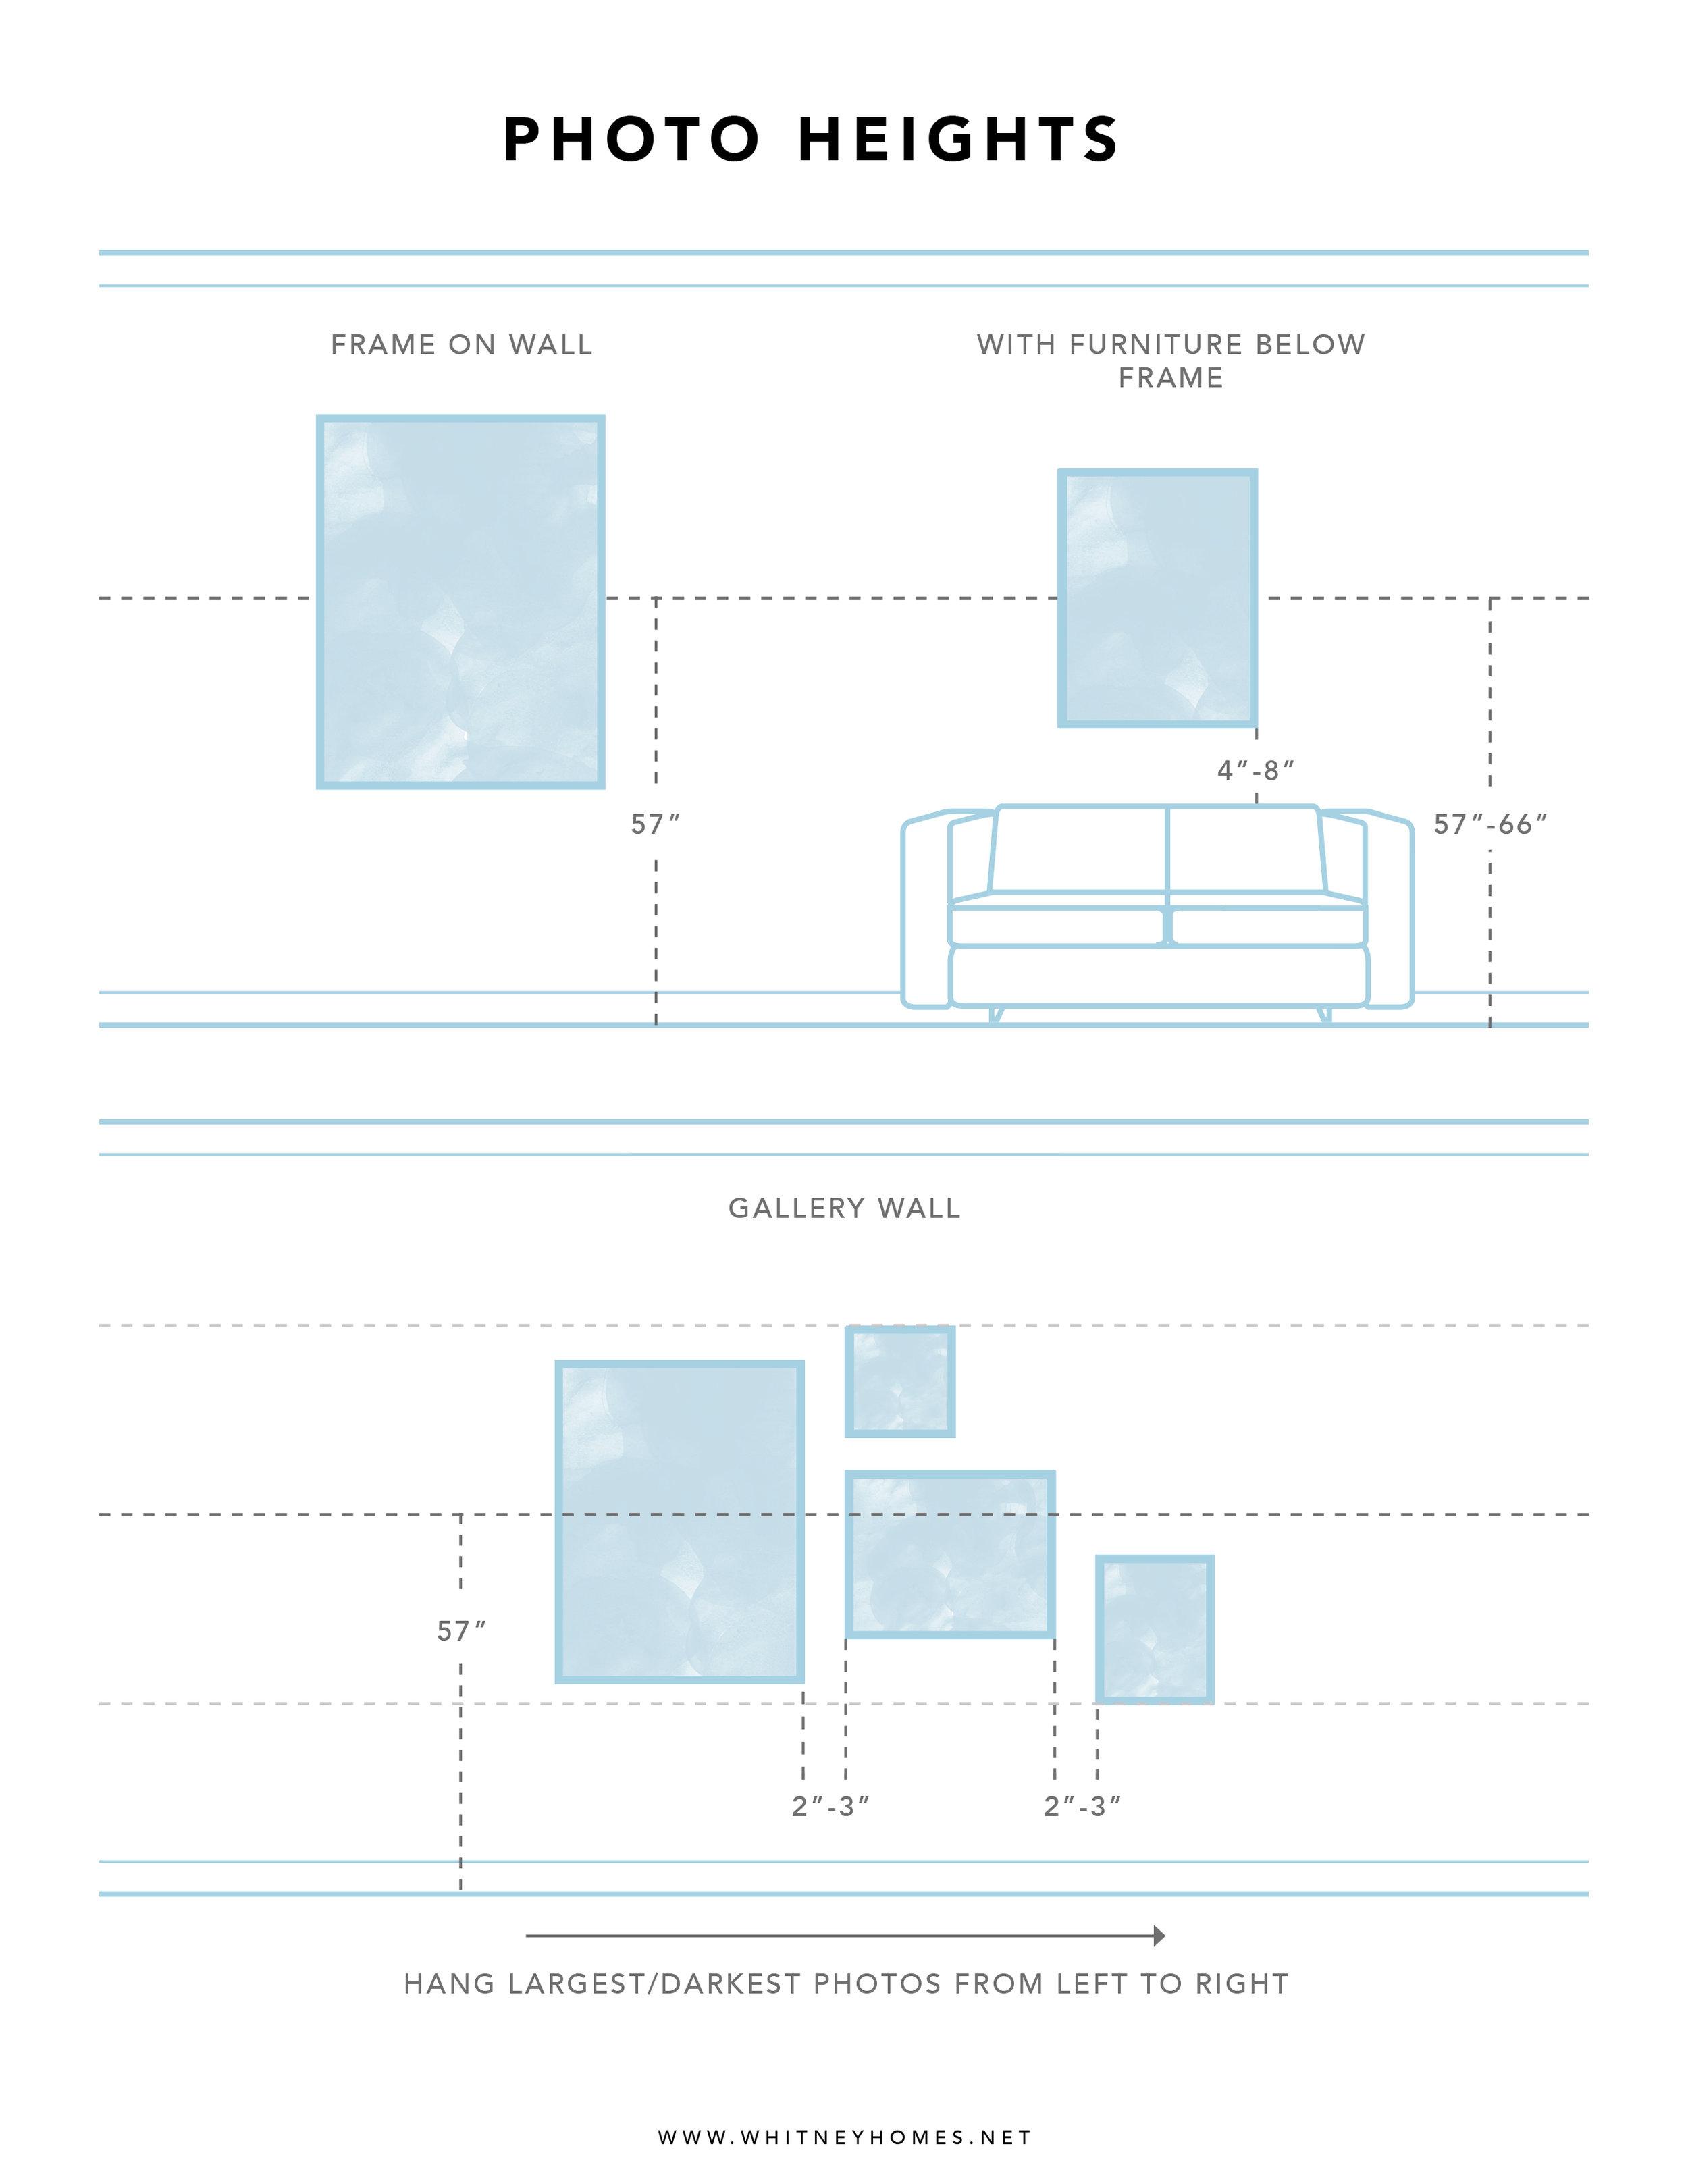 WH_Blog_For-Good-Measure_Graphics_1.jpg